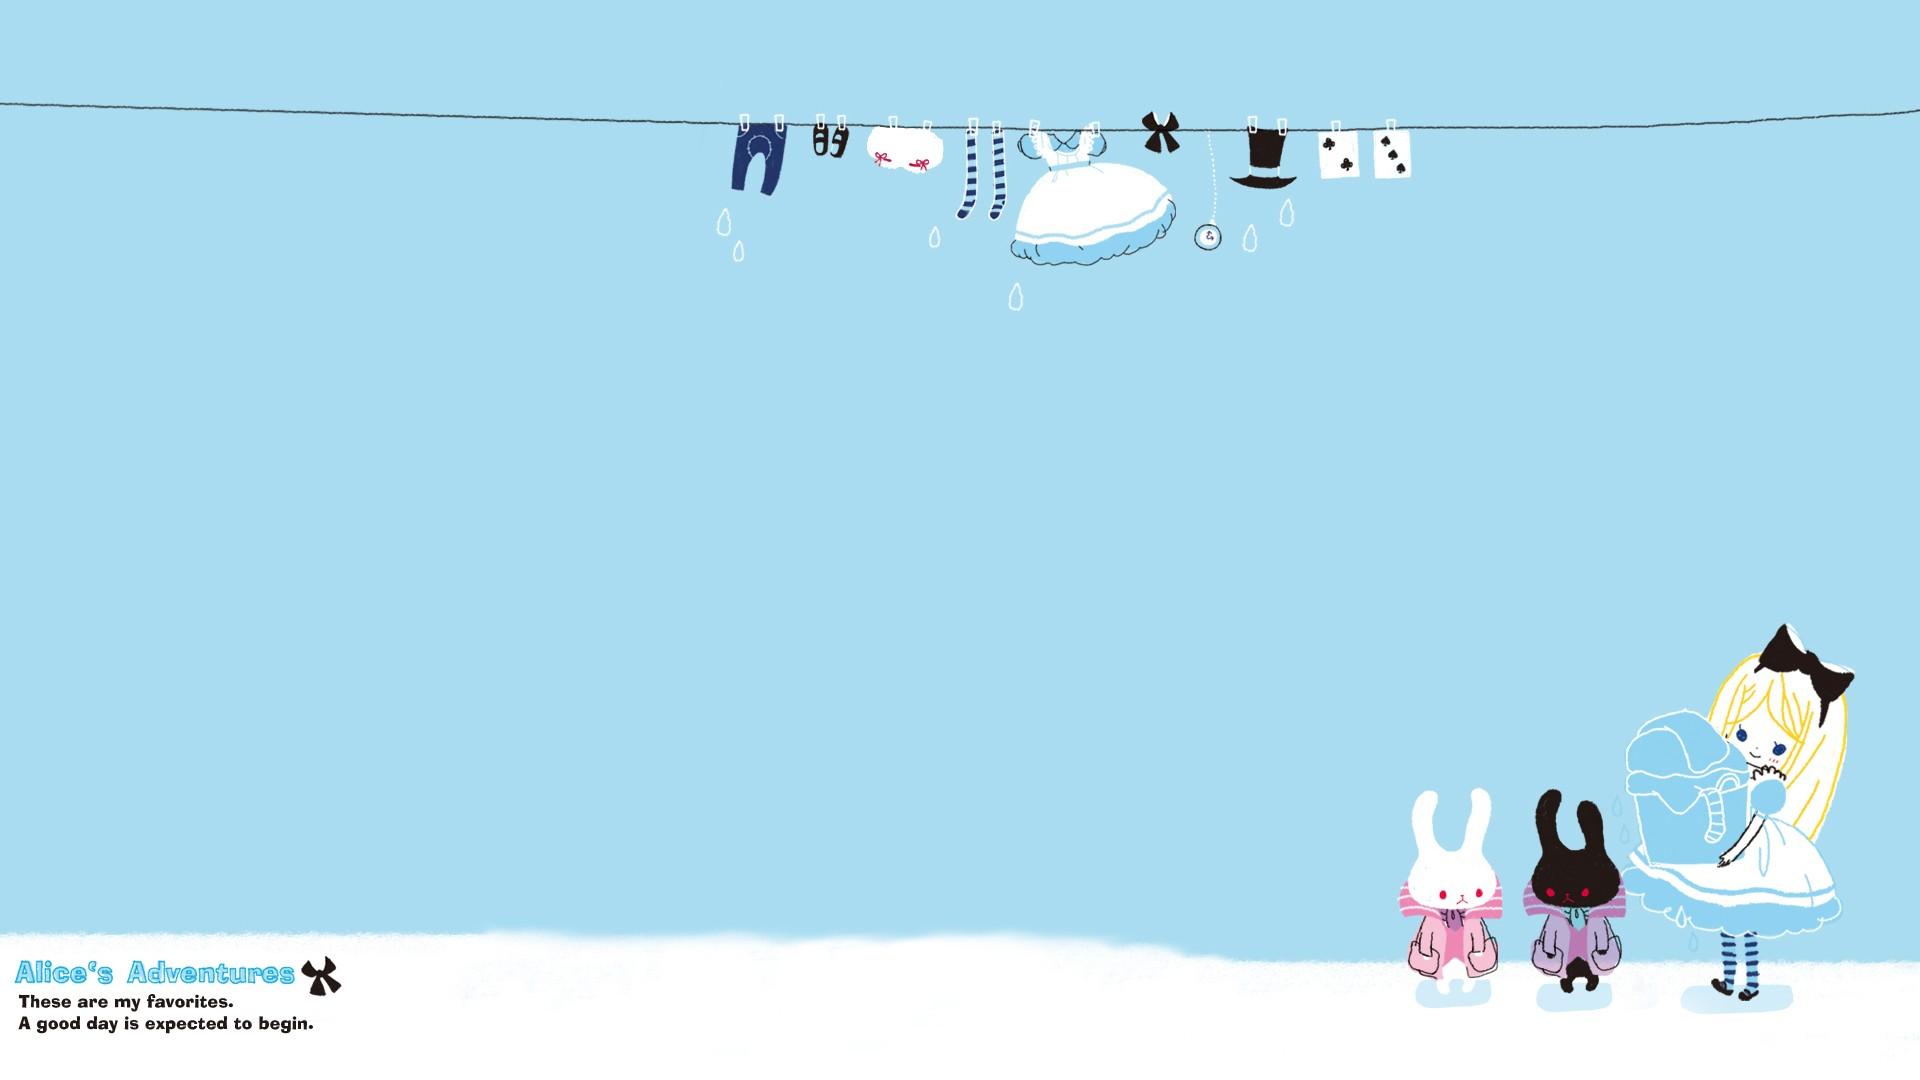 Hintergrundbilder : Illustration, Fahrzeug, Karikatur, Alice im ...